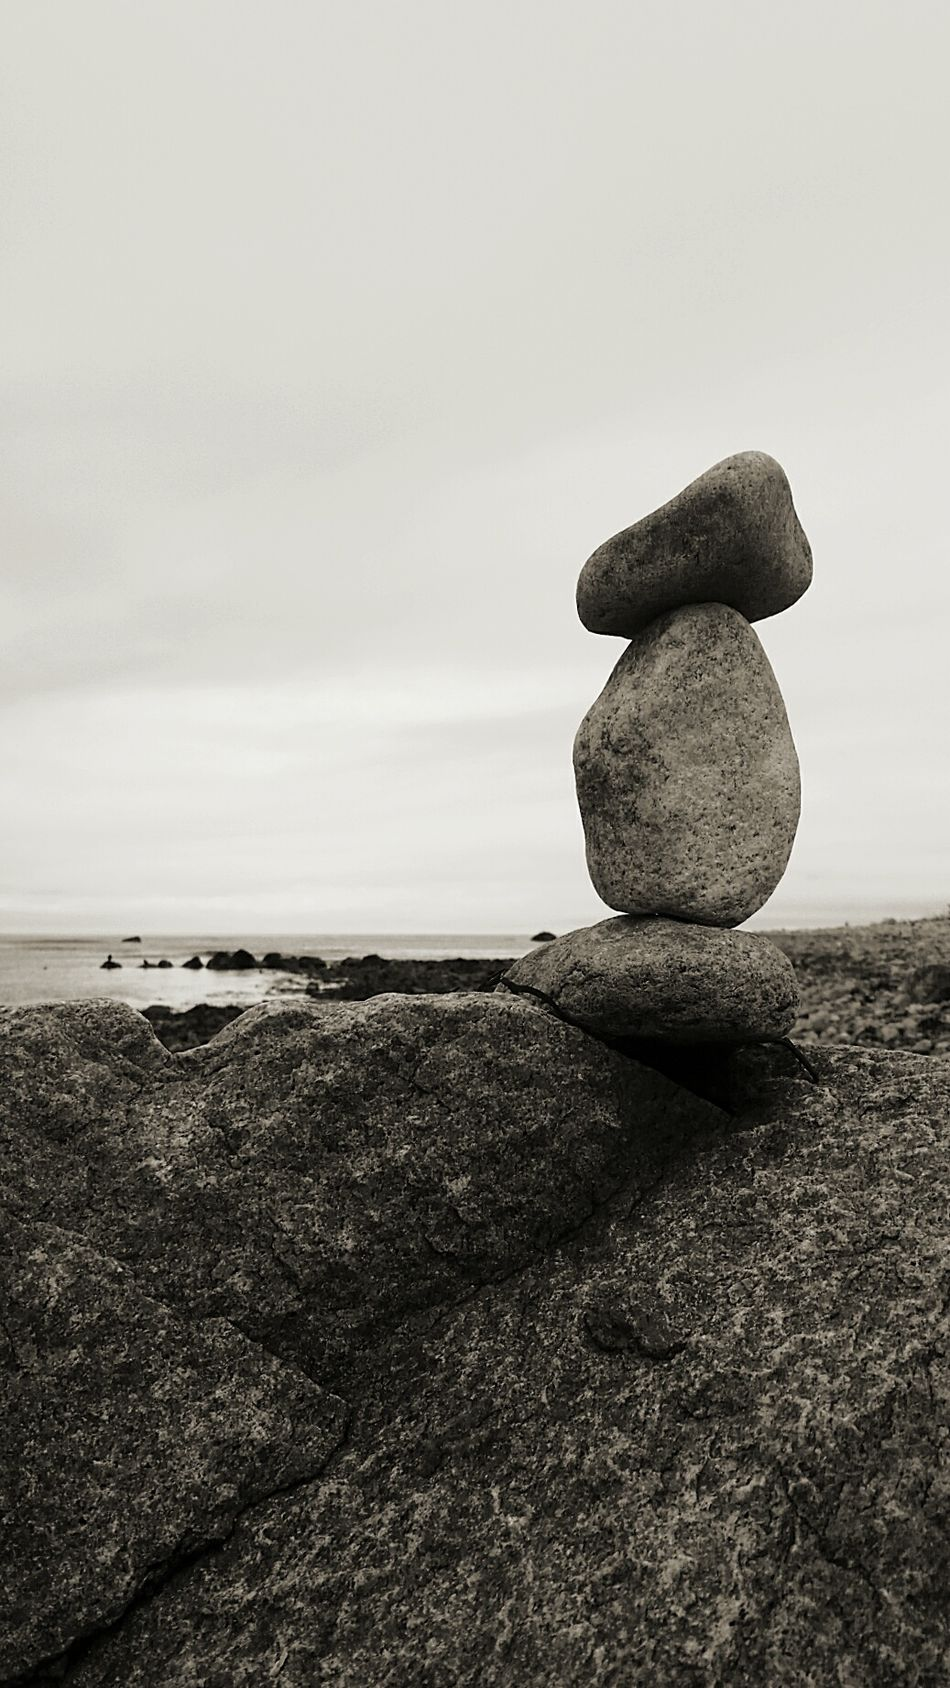 Rock Tower North Point Block Island Rhode Island 02807 Black And White Beach Ocean Rocks Edge Of The World